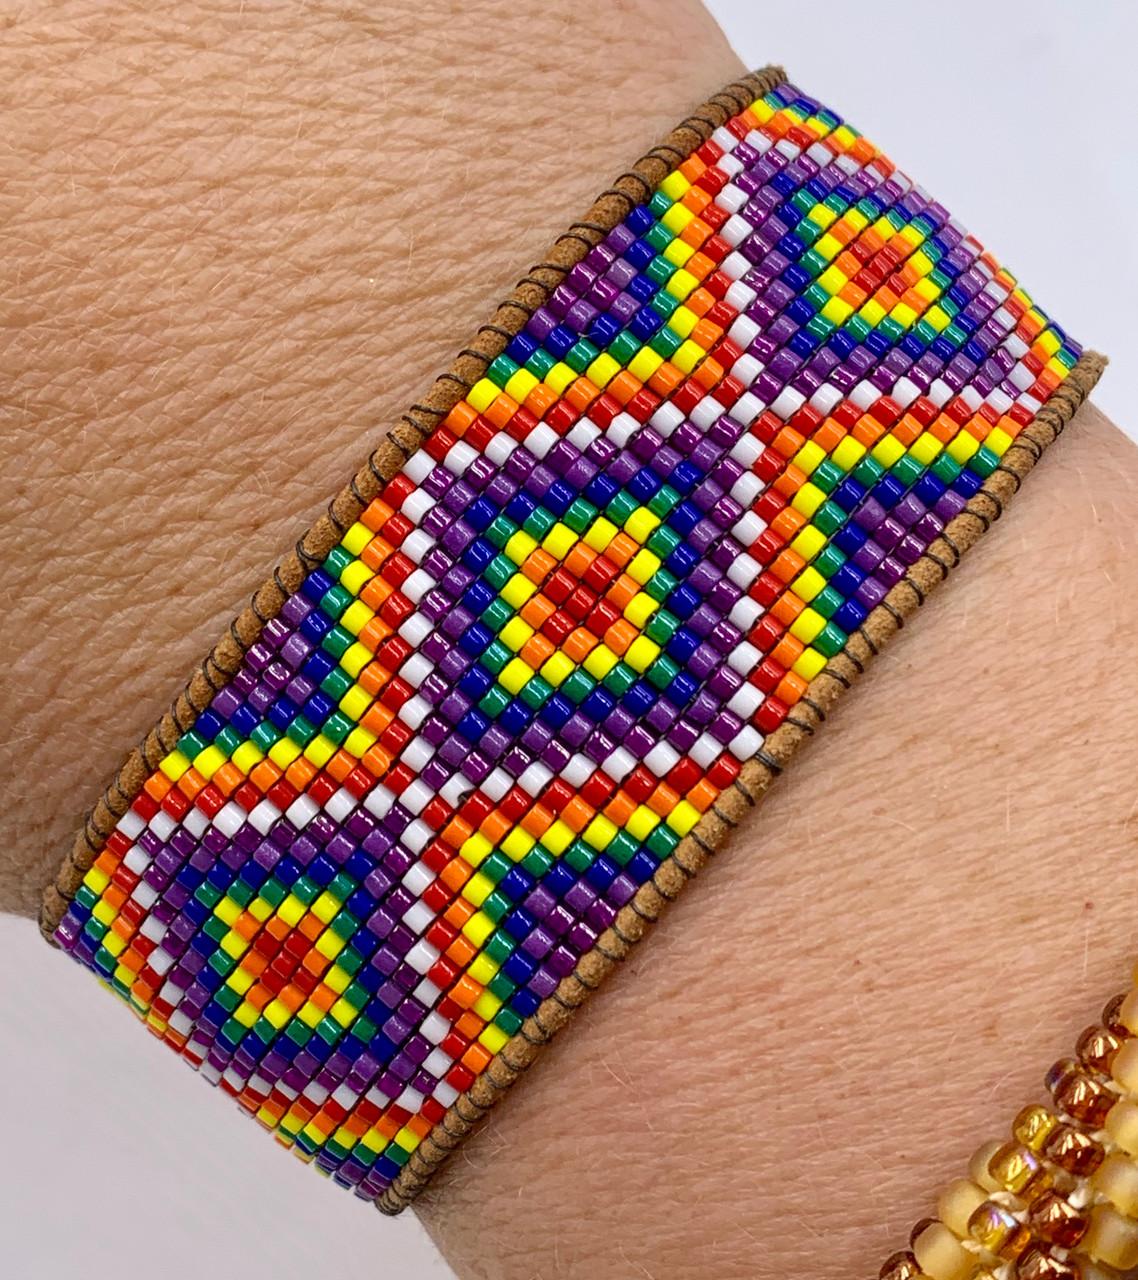 Rainbow Diamonds Loom Bracelet INSTANT DOWNLOAD Pattern & Video Access